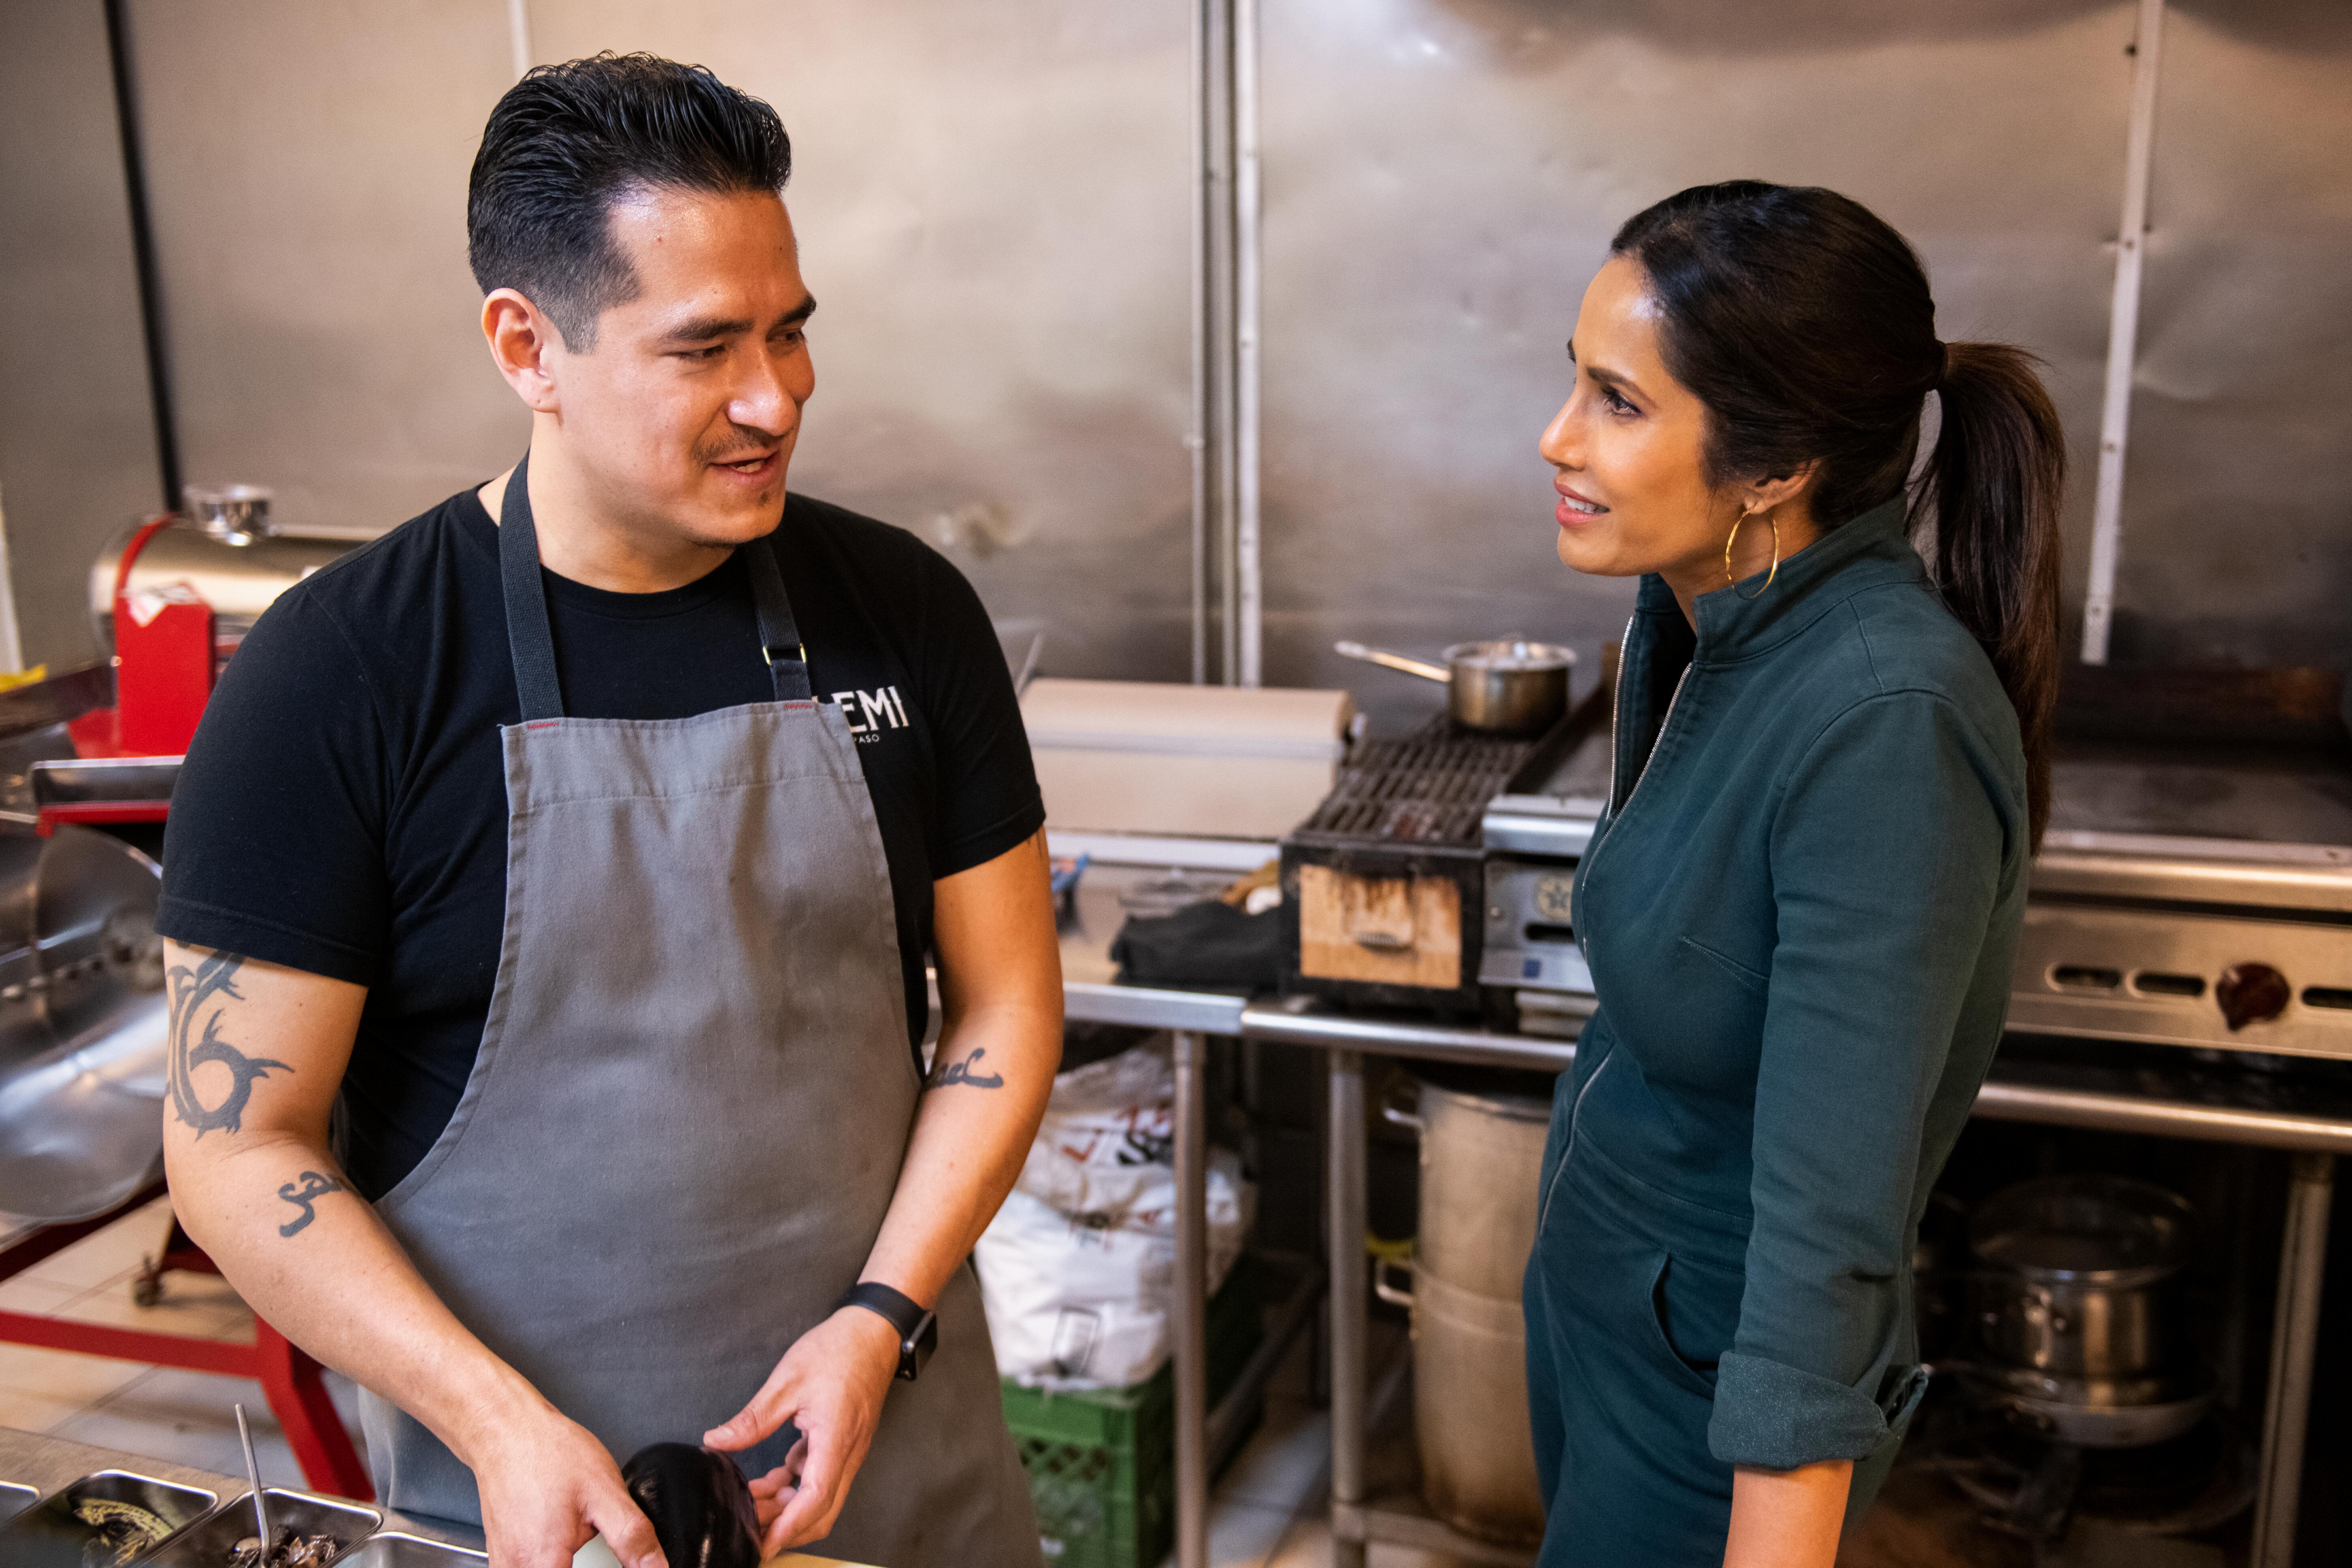 Padma Lakshmi with chef Emiliano Marentes of El Paso's Elemi in 'Taste the Nation'